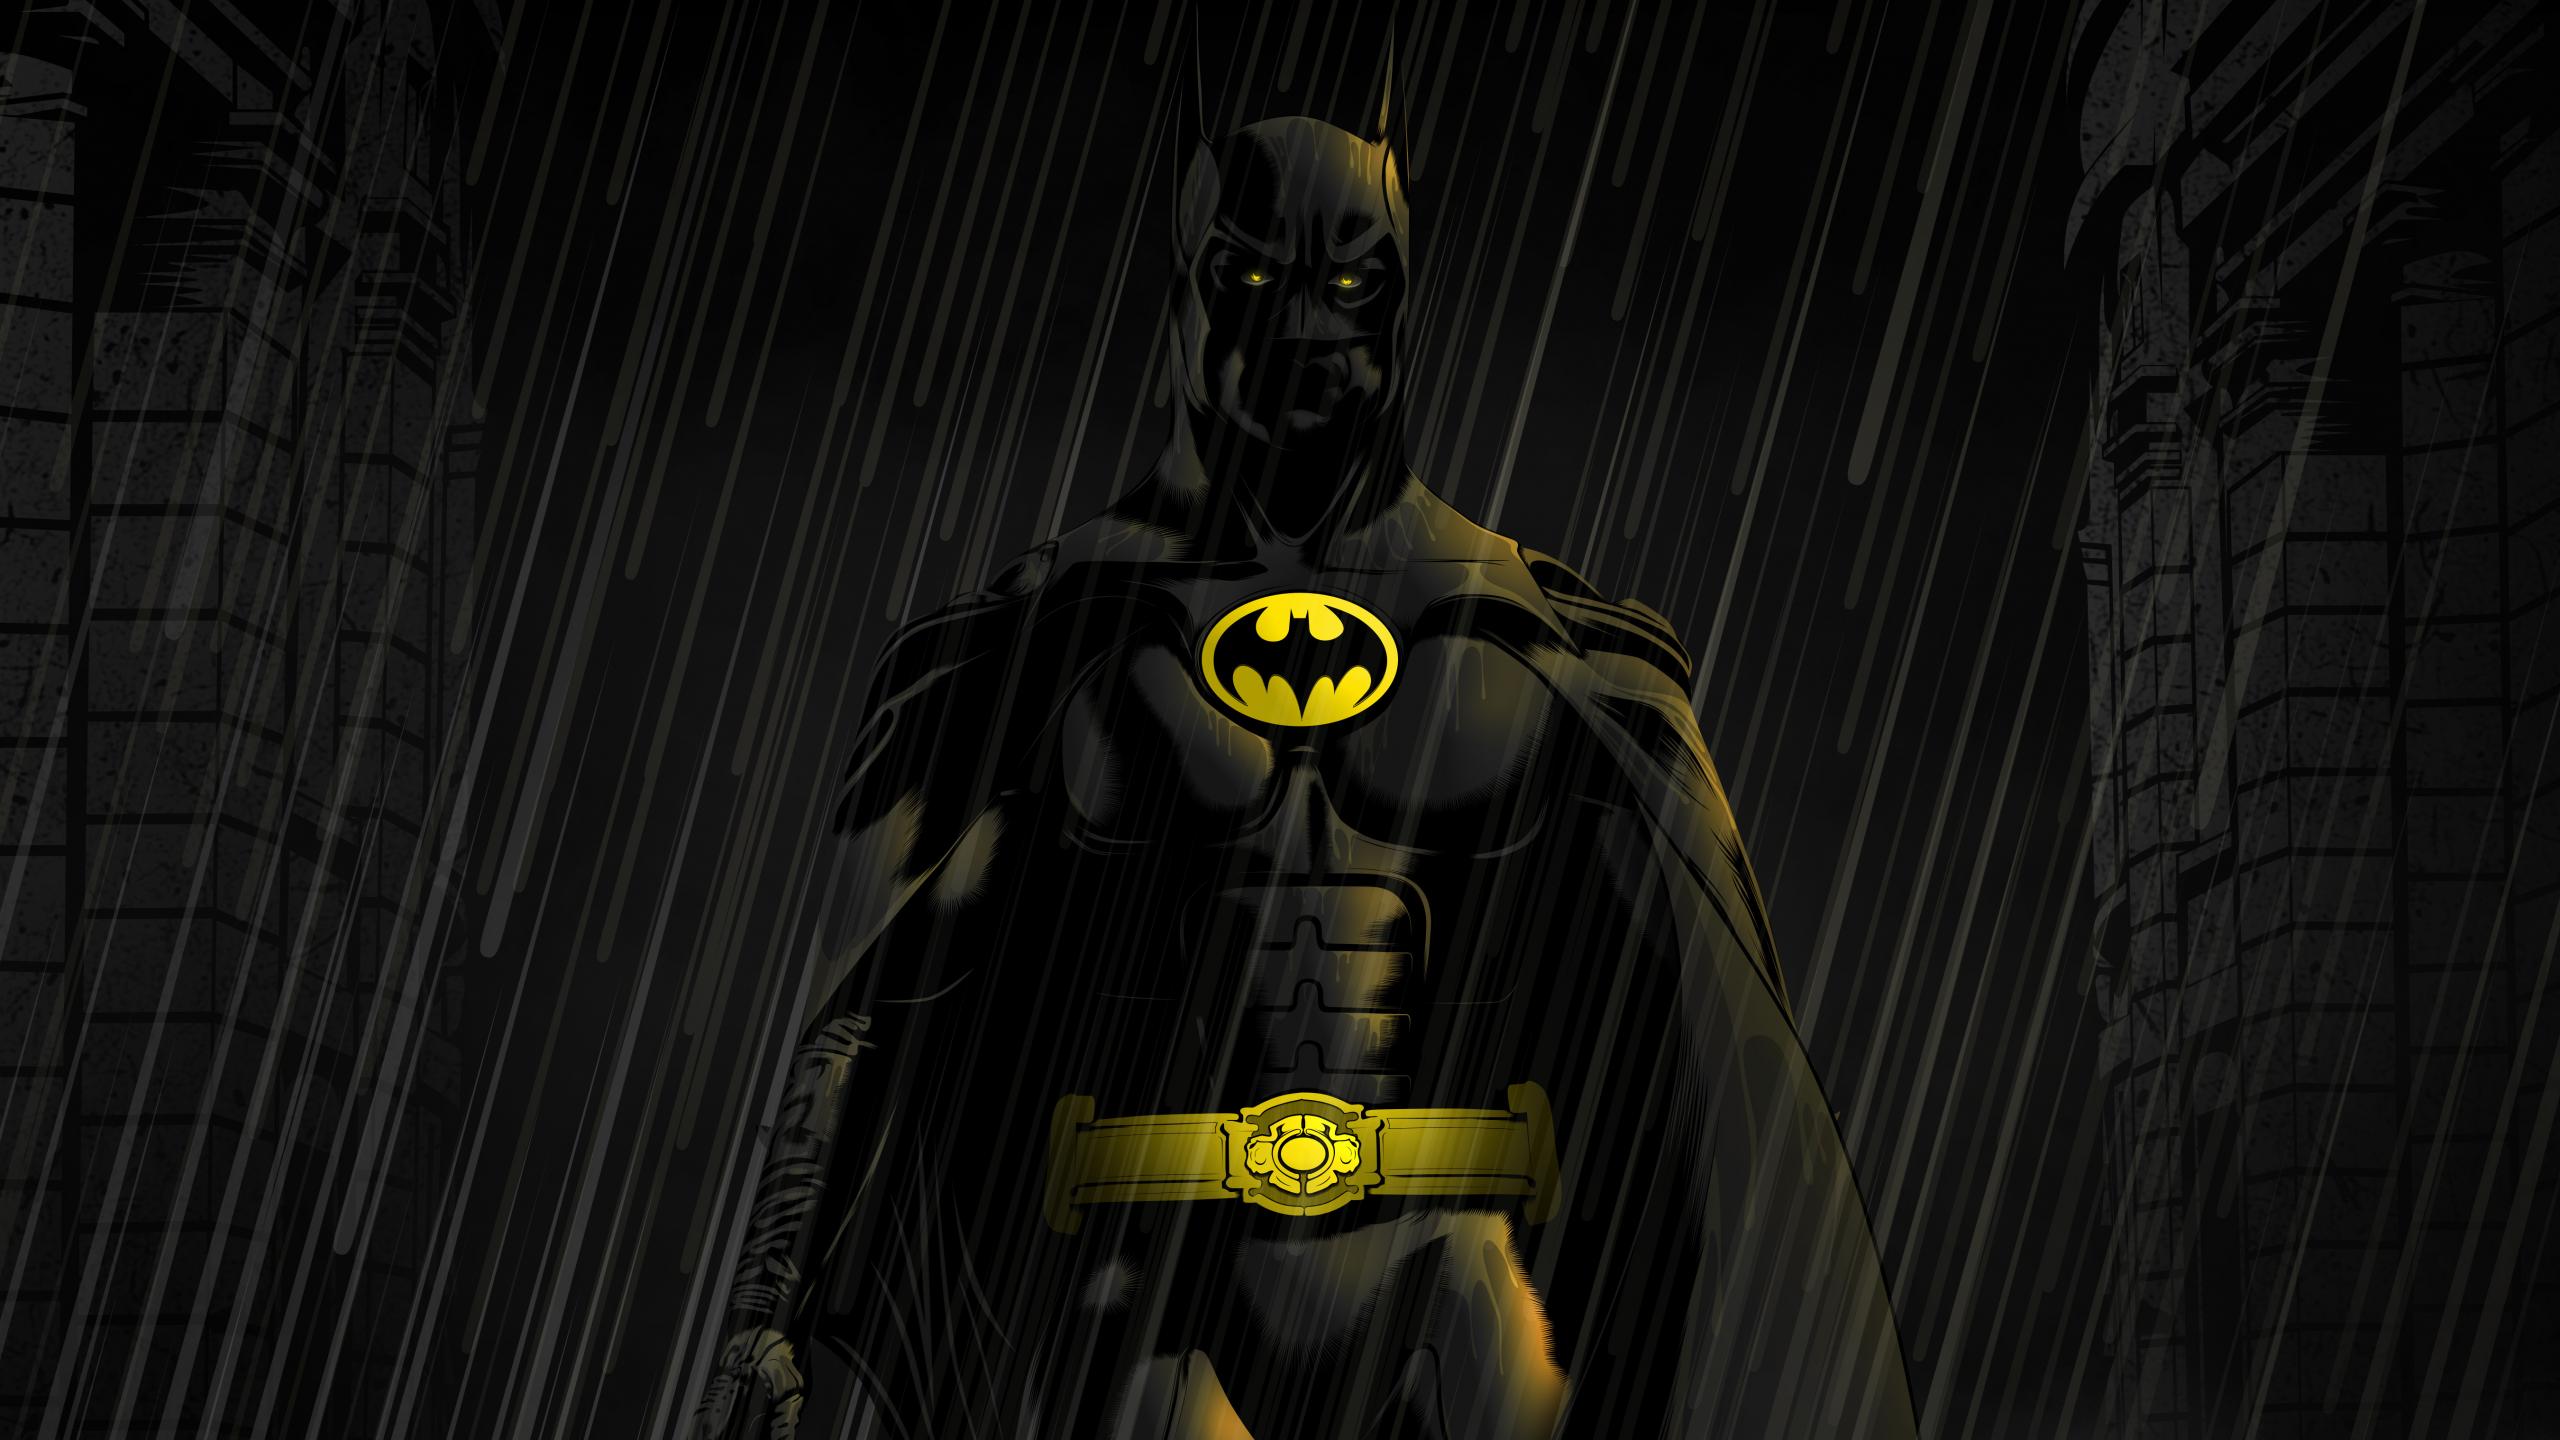 Download 2560x1440 wallpaper batman, dark, rain, artwork ...